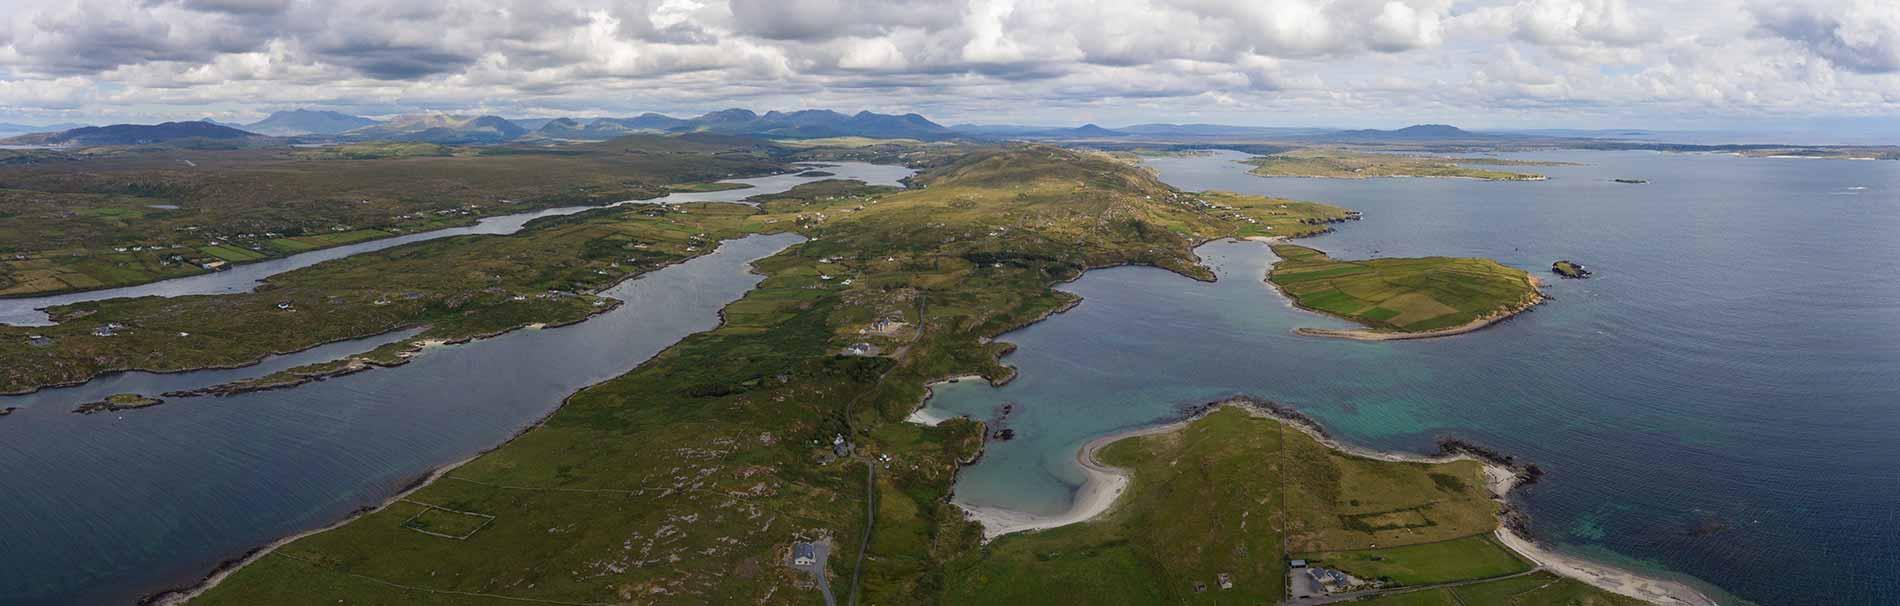 Aerial shot of the west coast of Ireland